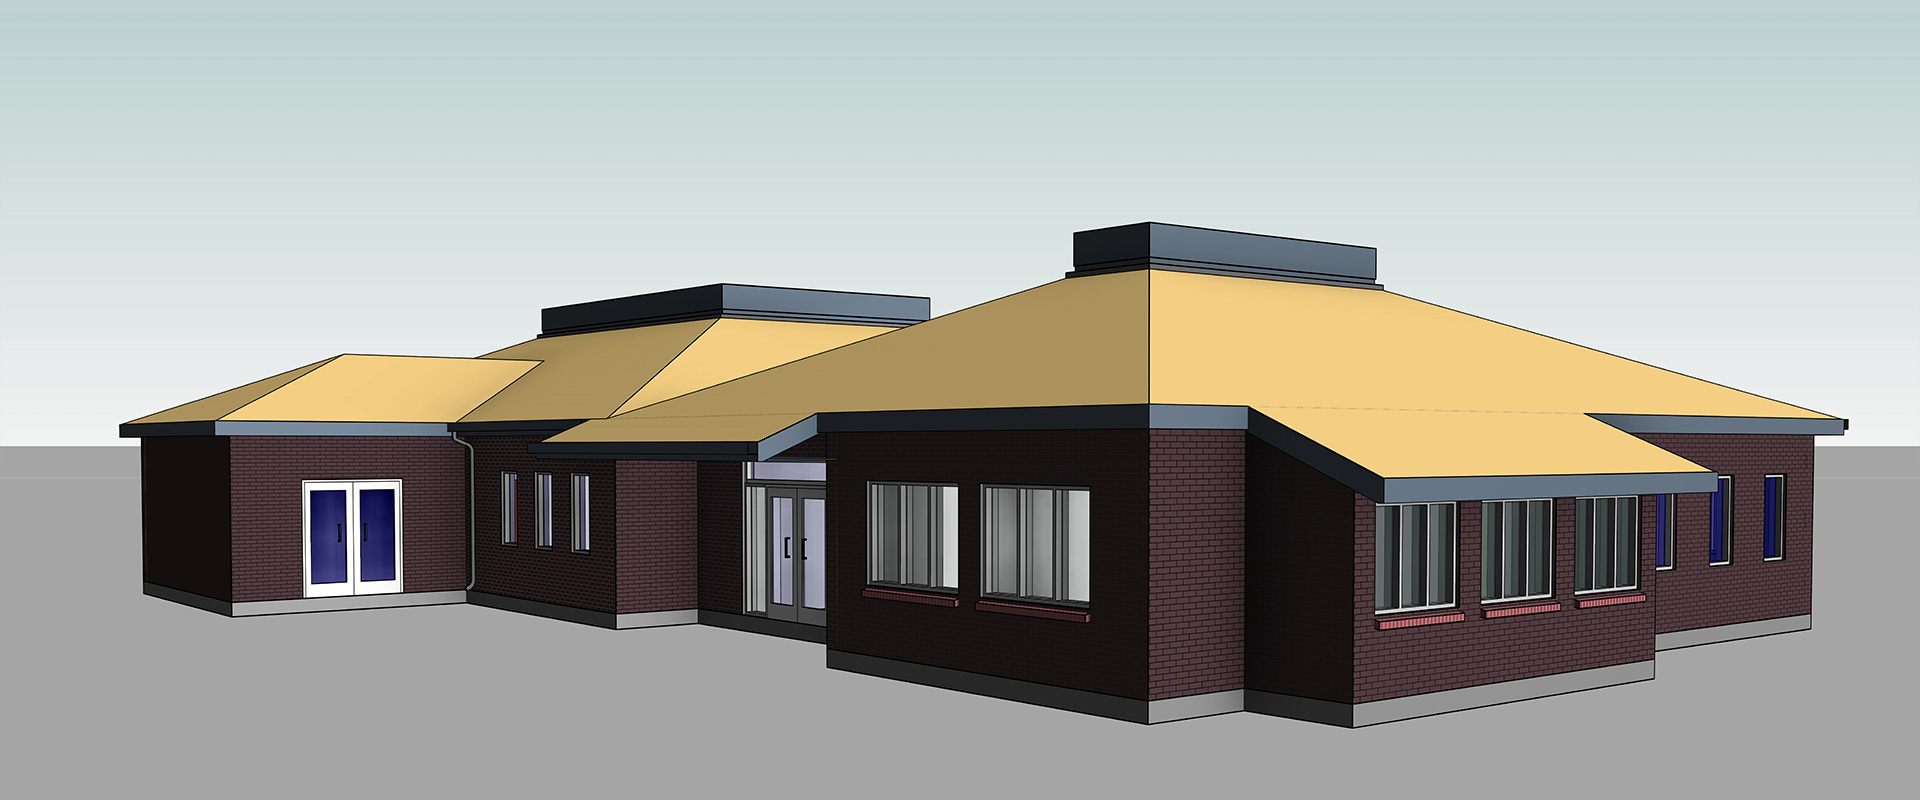 Architectural_Revit_Modeling_Birken-Inspection-Lab_BIM_Project_by_United-BIM